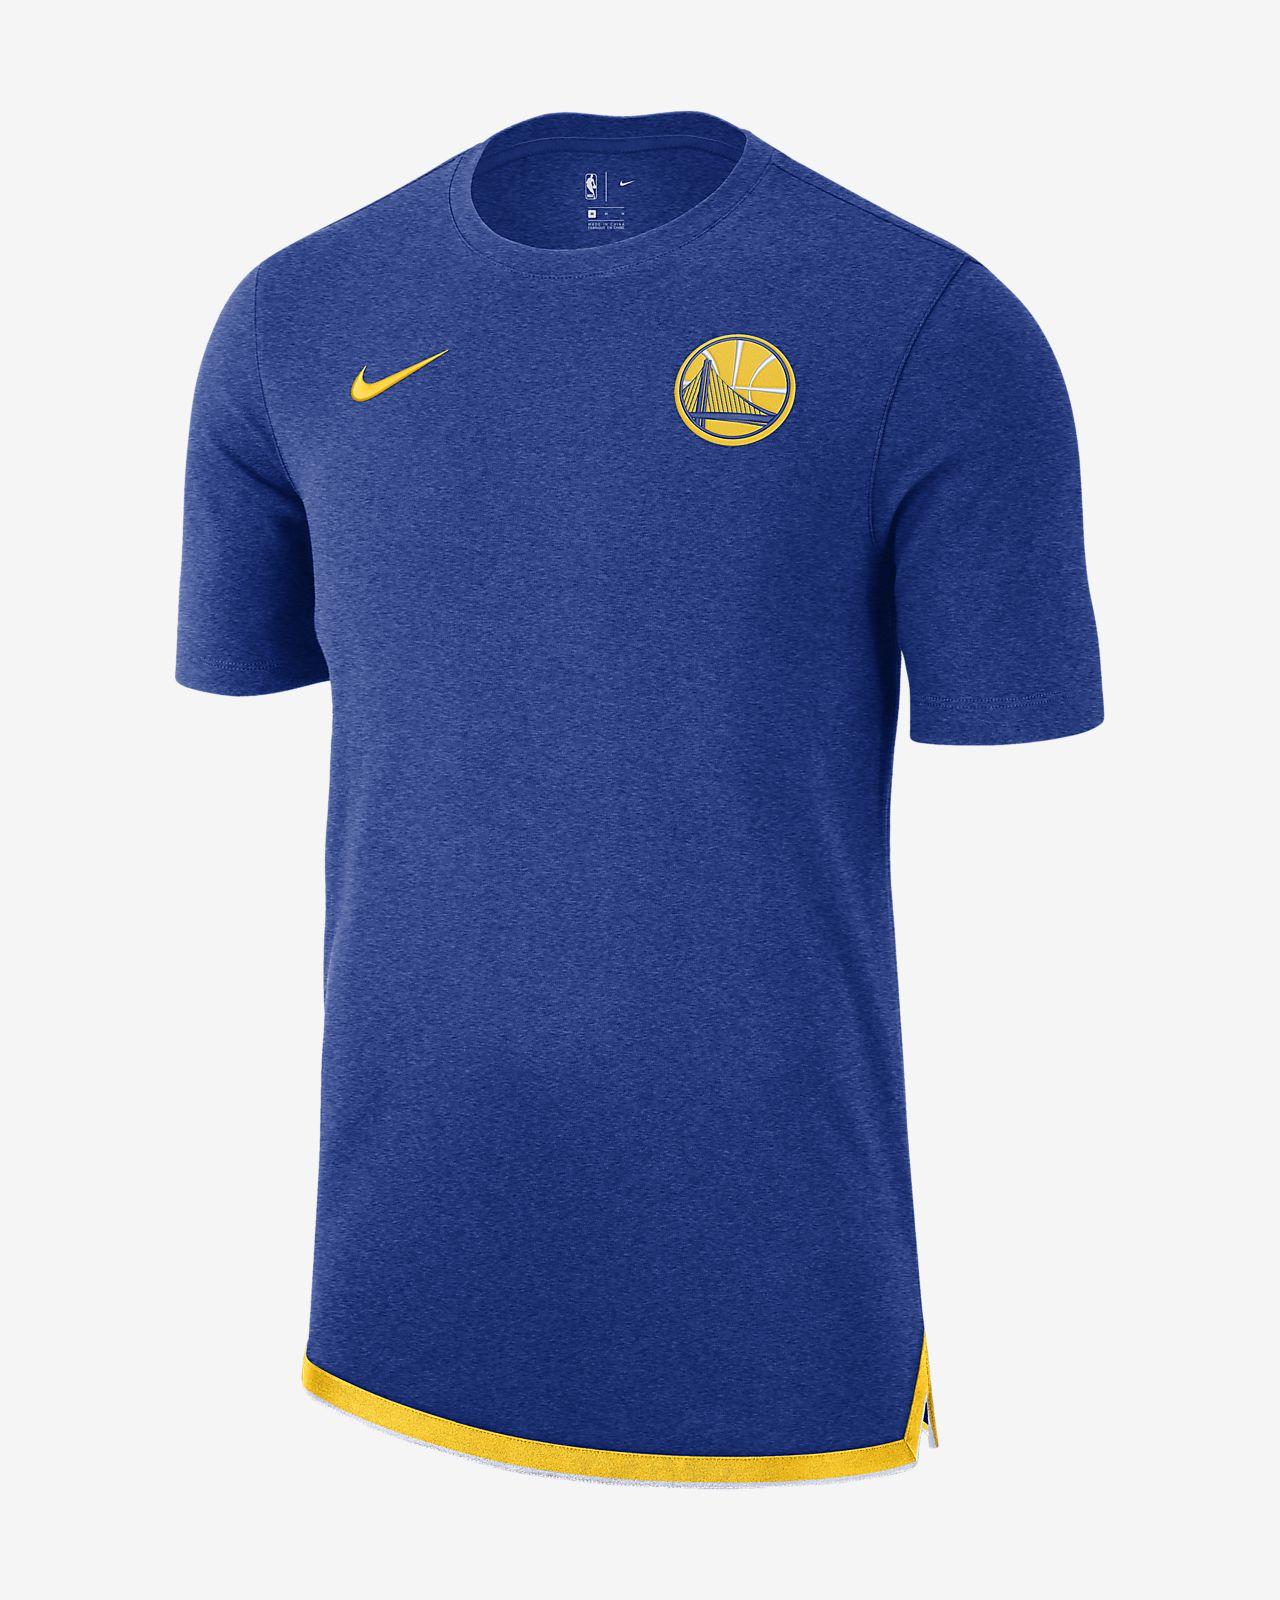 e5095c91f2 Golden State Warriors Nike Men s NBA Top. Nike.com